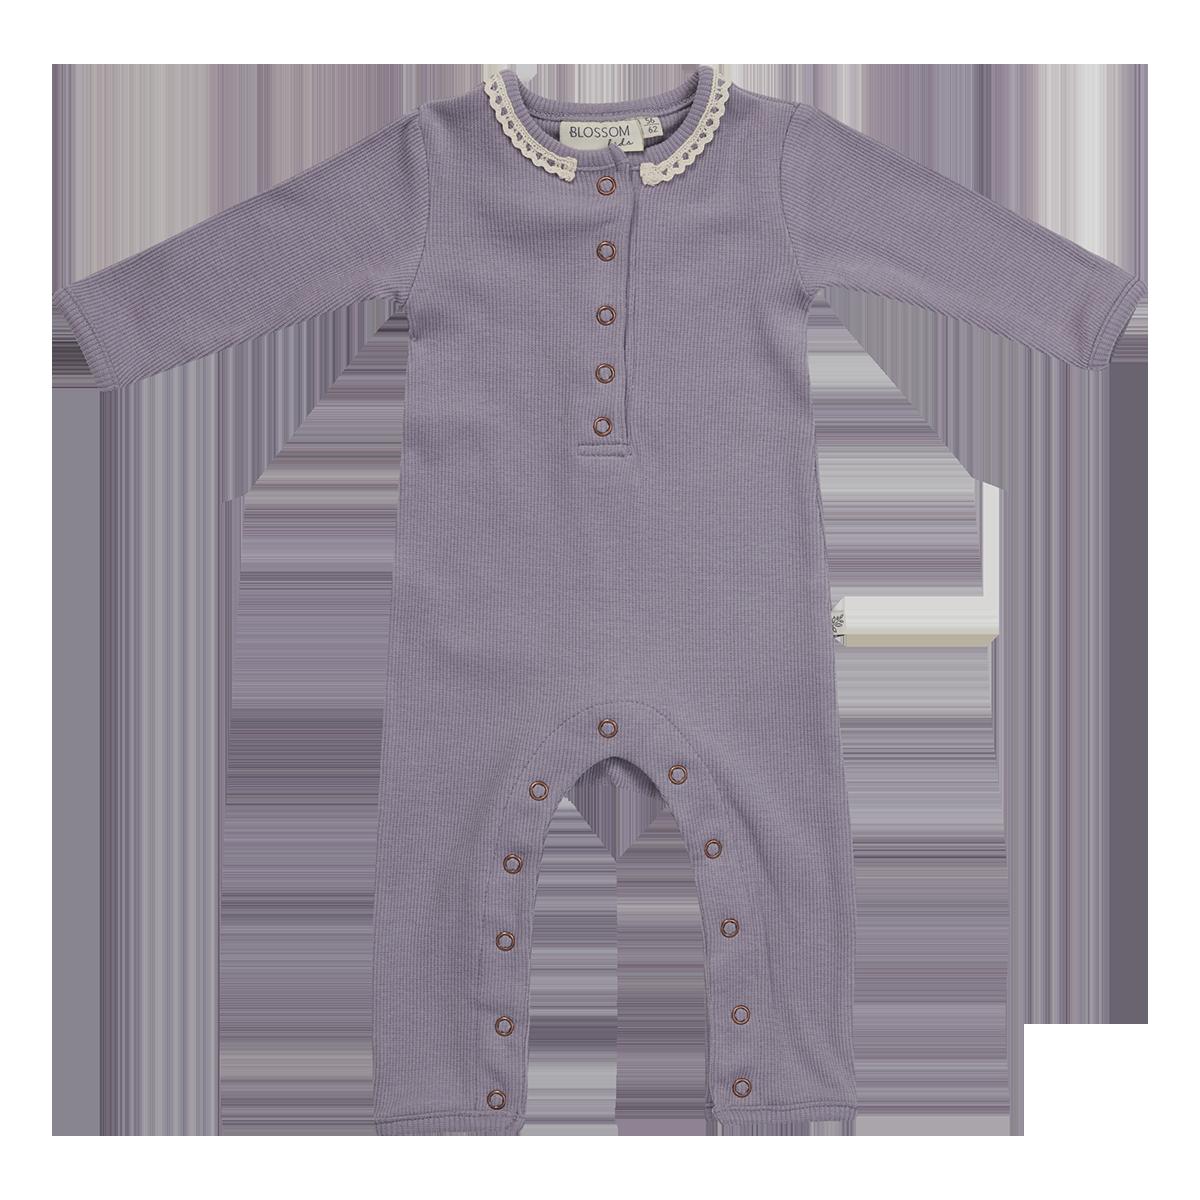 Blossom Kids Playsuit - soft rib - Lavender Grey-1